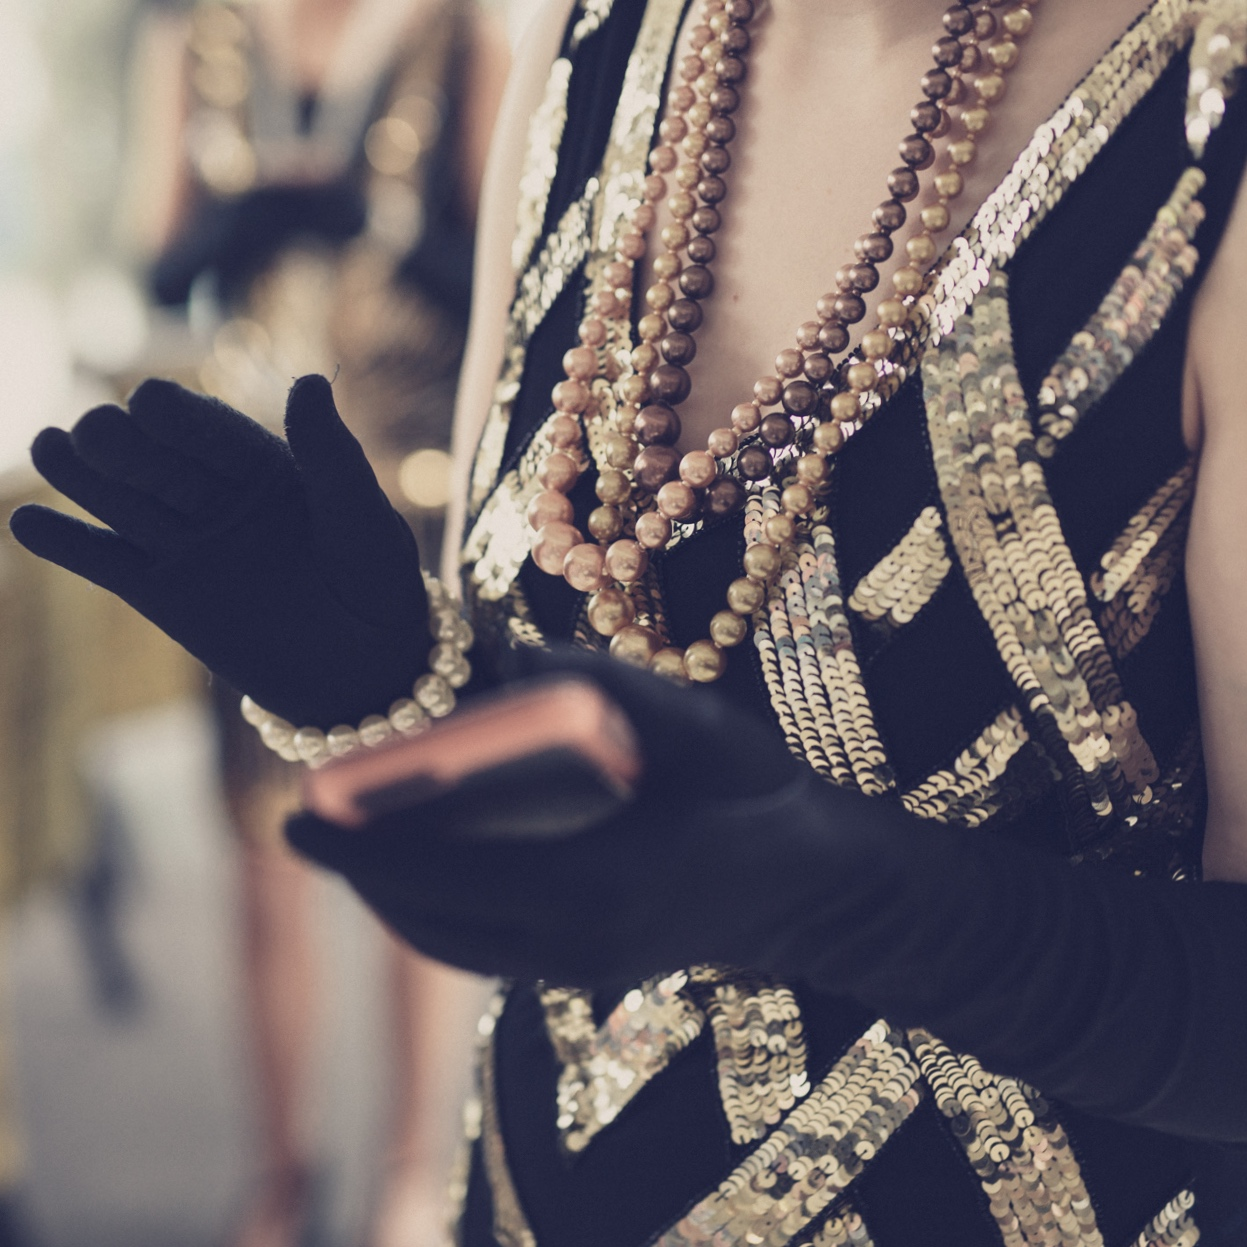 Behind the scenes on a vintage shoot featuring Charleston dancers ©Julie Corcoran